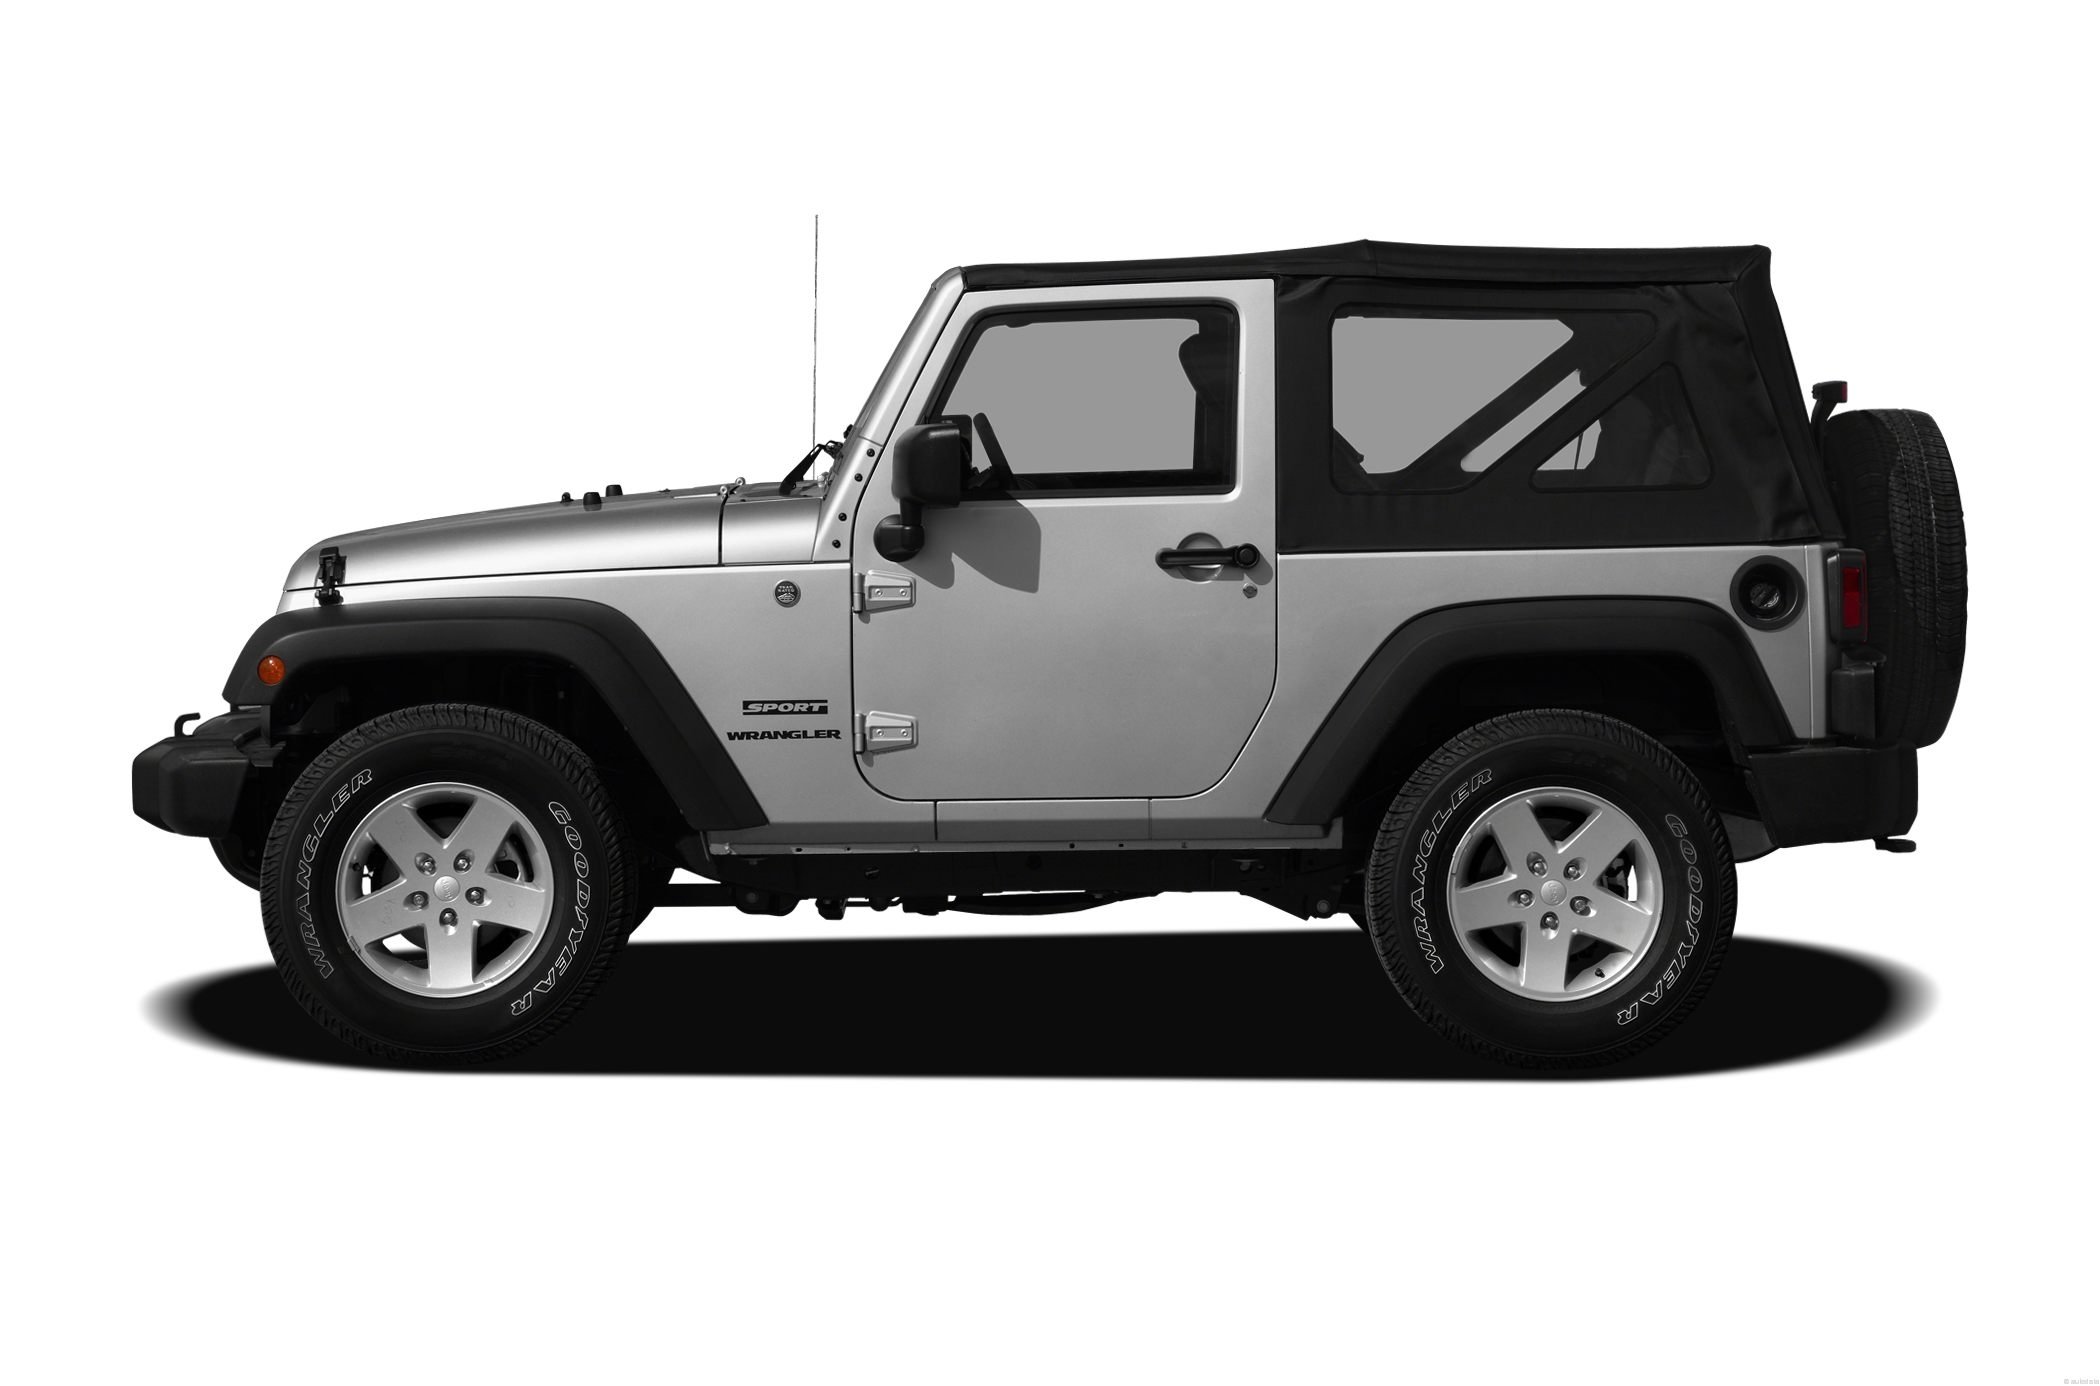 jeep wrangler invoice price 2014 invoice template free 2016 jeep wrangler invoice price